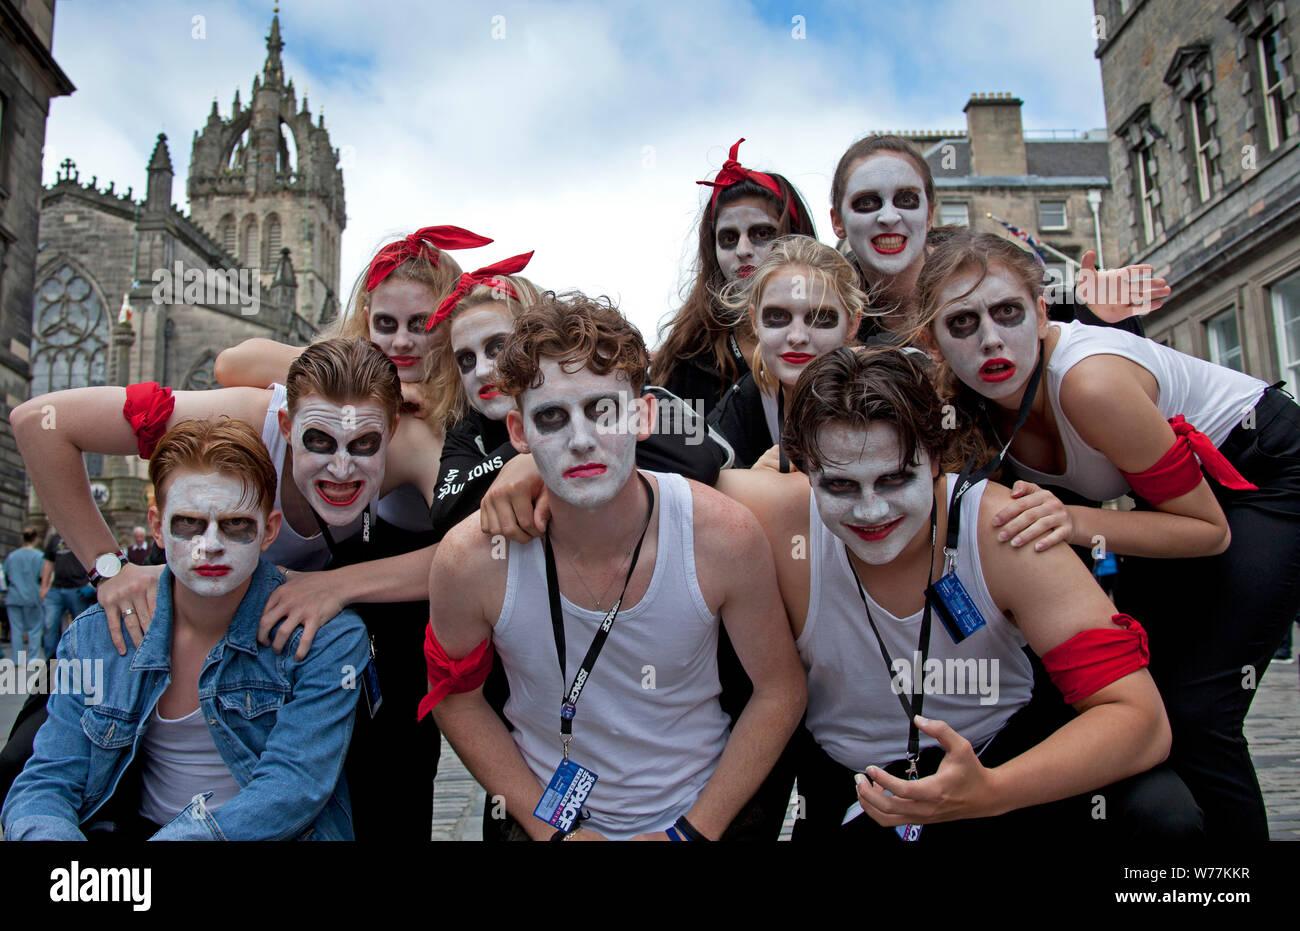 Edinburgh Festival Fringe, Royal Mile, Scotland, UK  5th